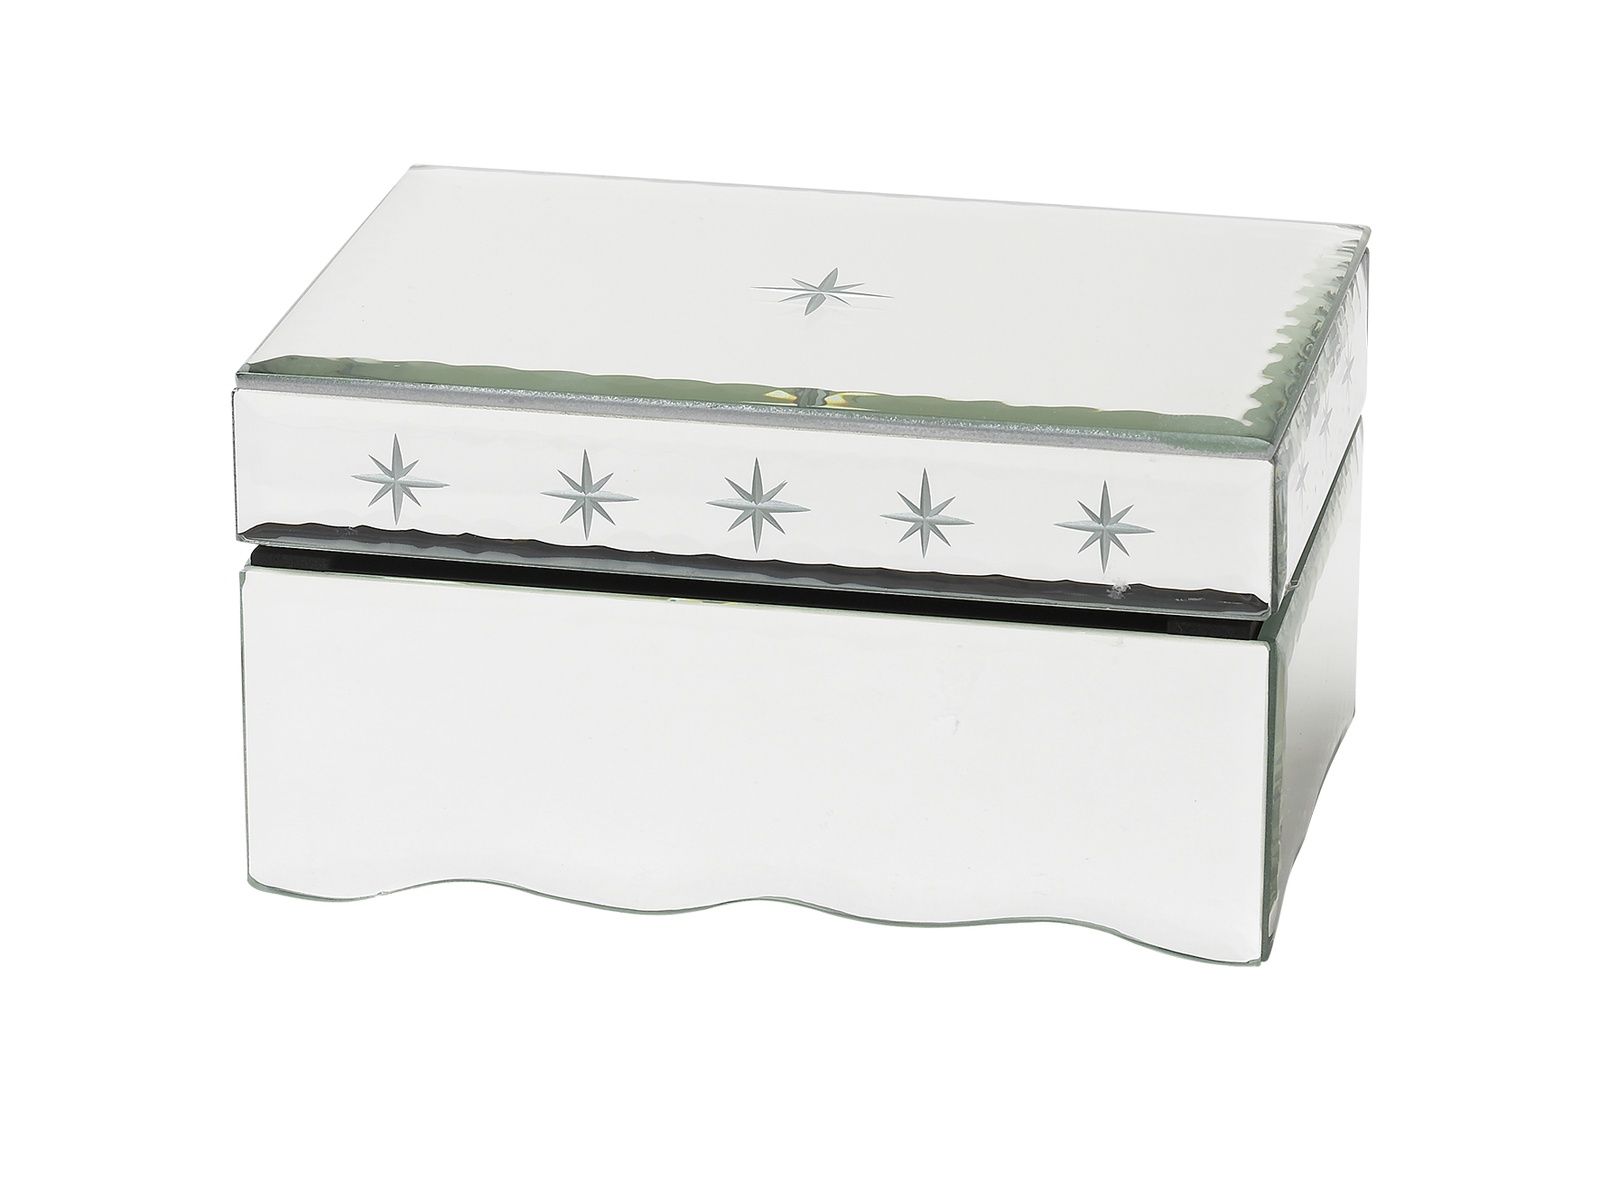 цены Шкатулка Molly Marais большая, Размер: Высота 13, ширина 15, длина 20., Цвет: Белый, BX520001